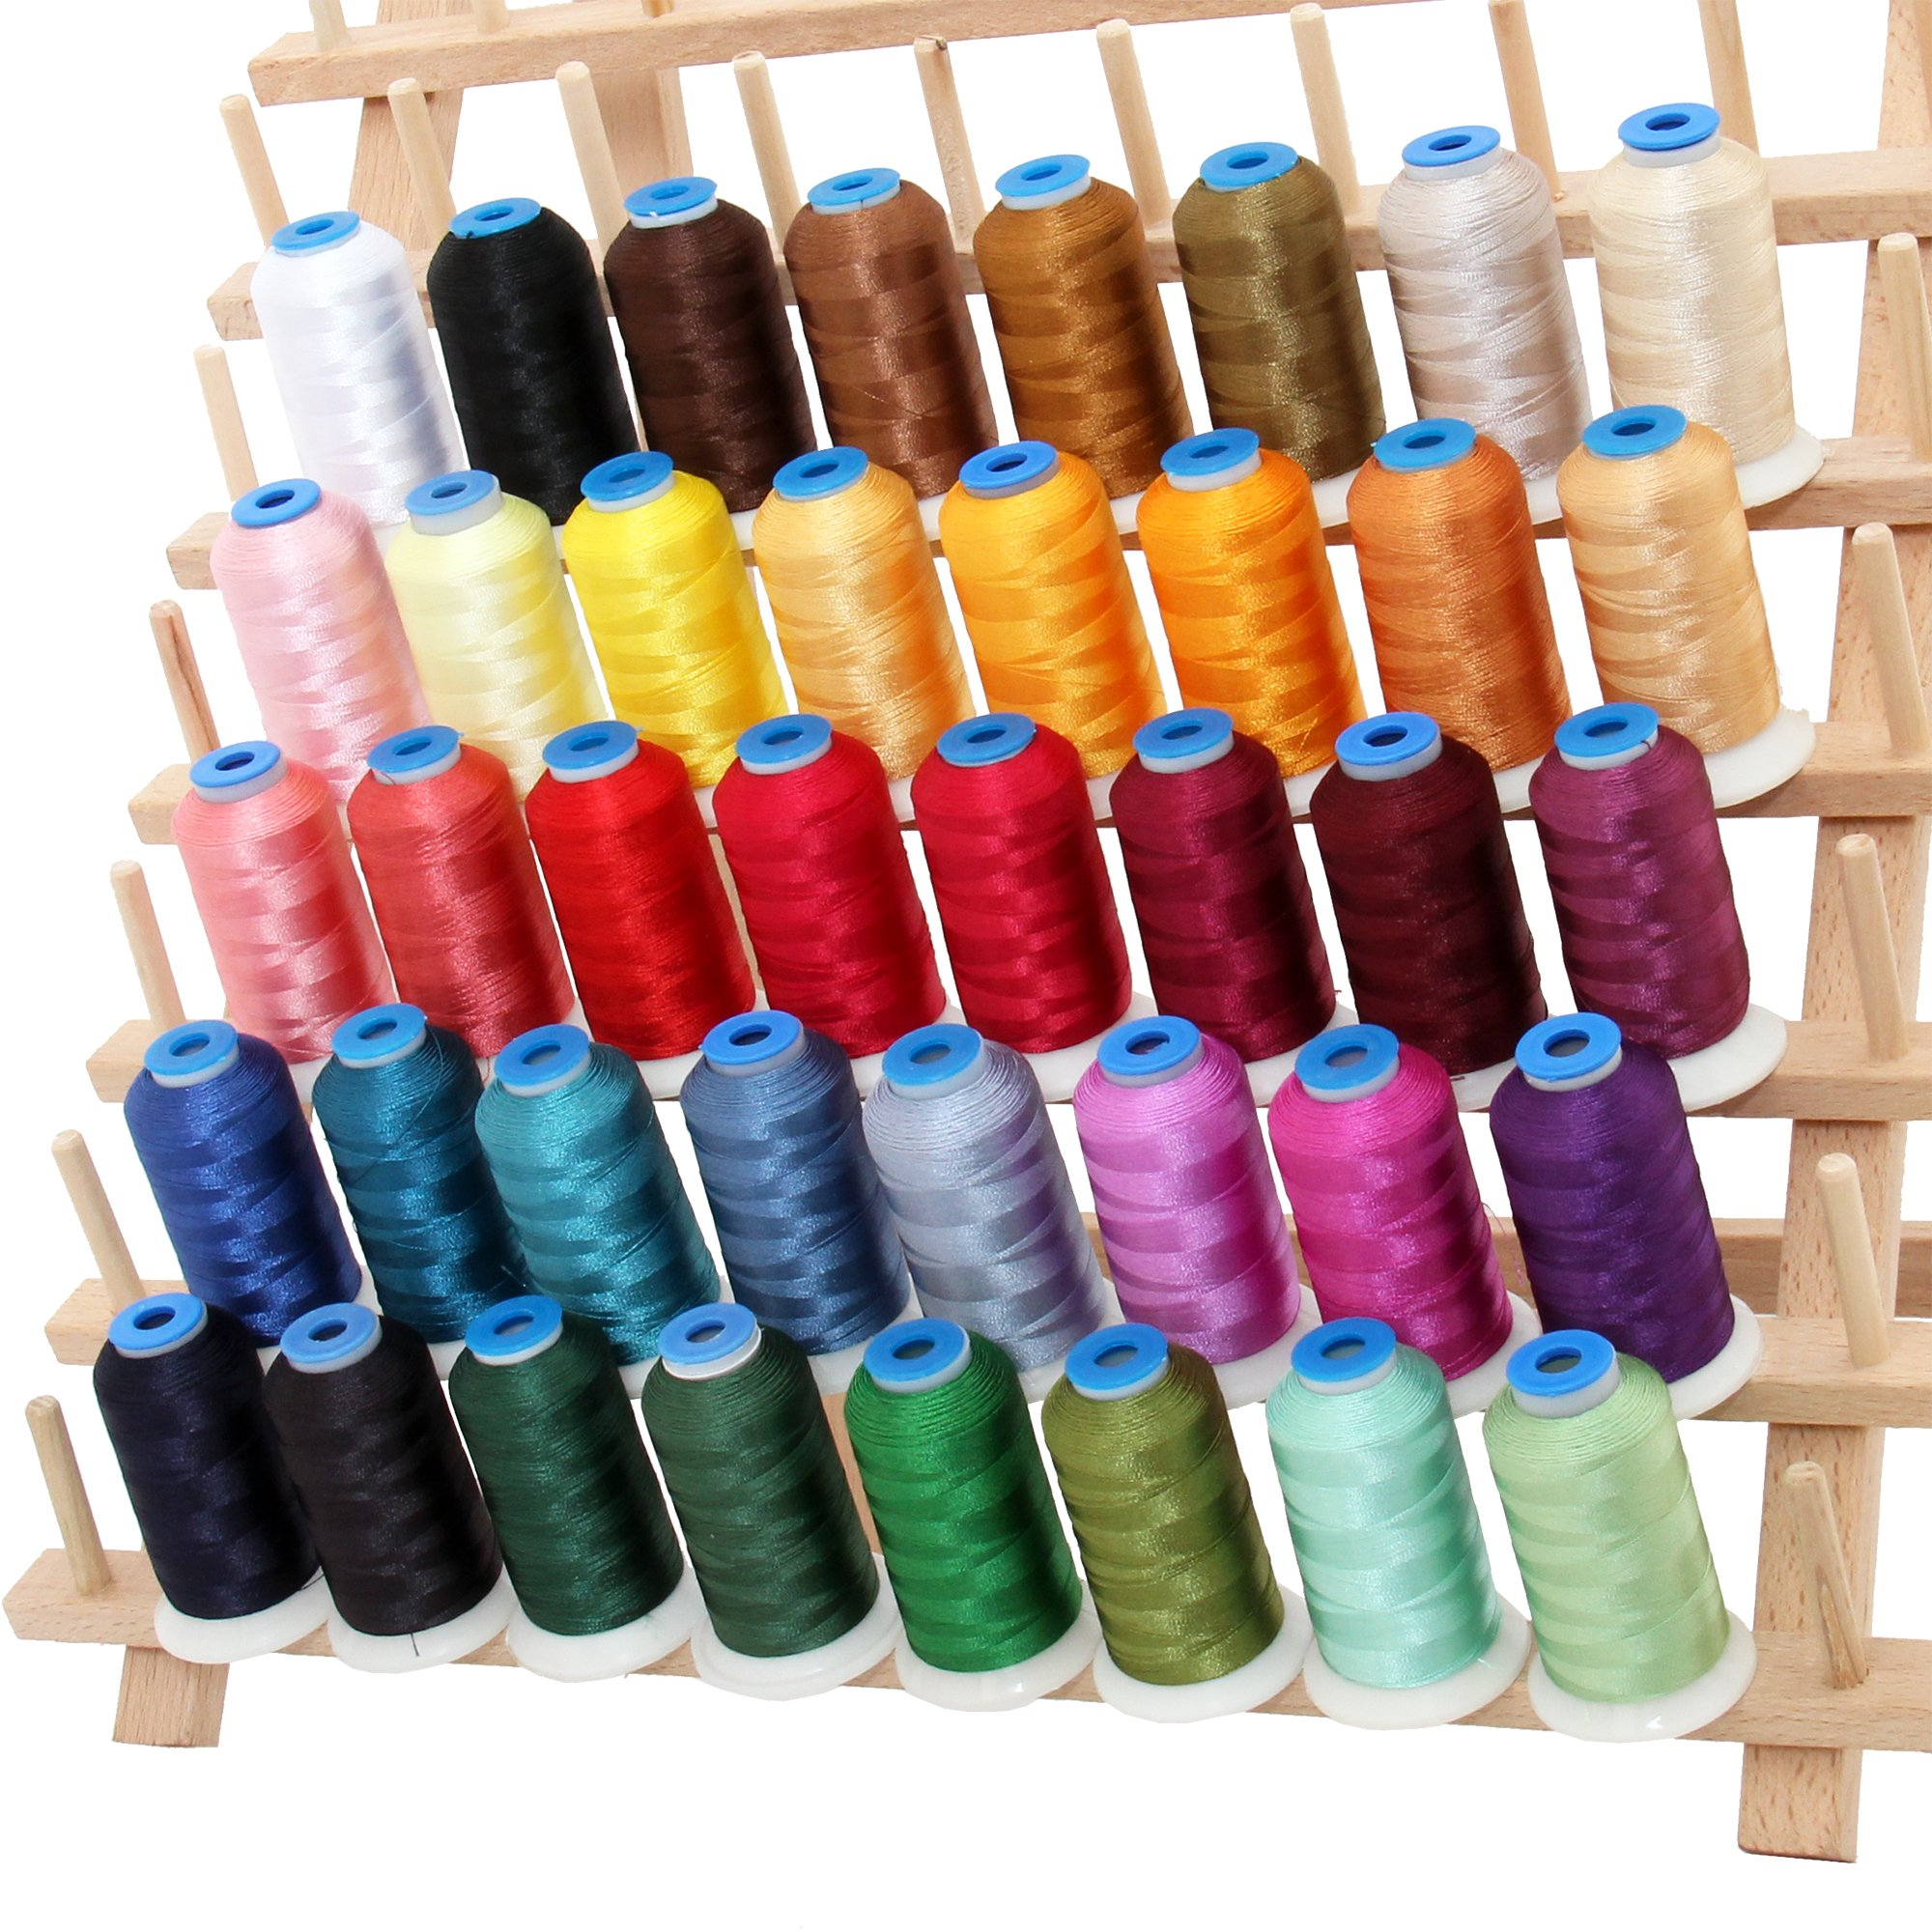 40 Cone Rayon Embroidery Thread Set - Set A Vibrant Colors - 1000m Cones - Threadart by Threadart